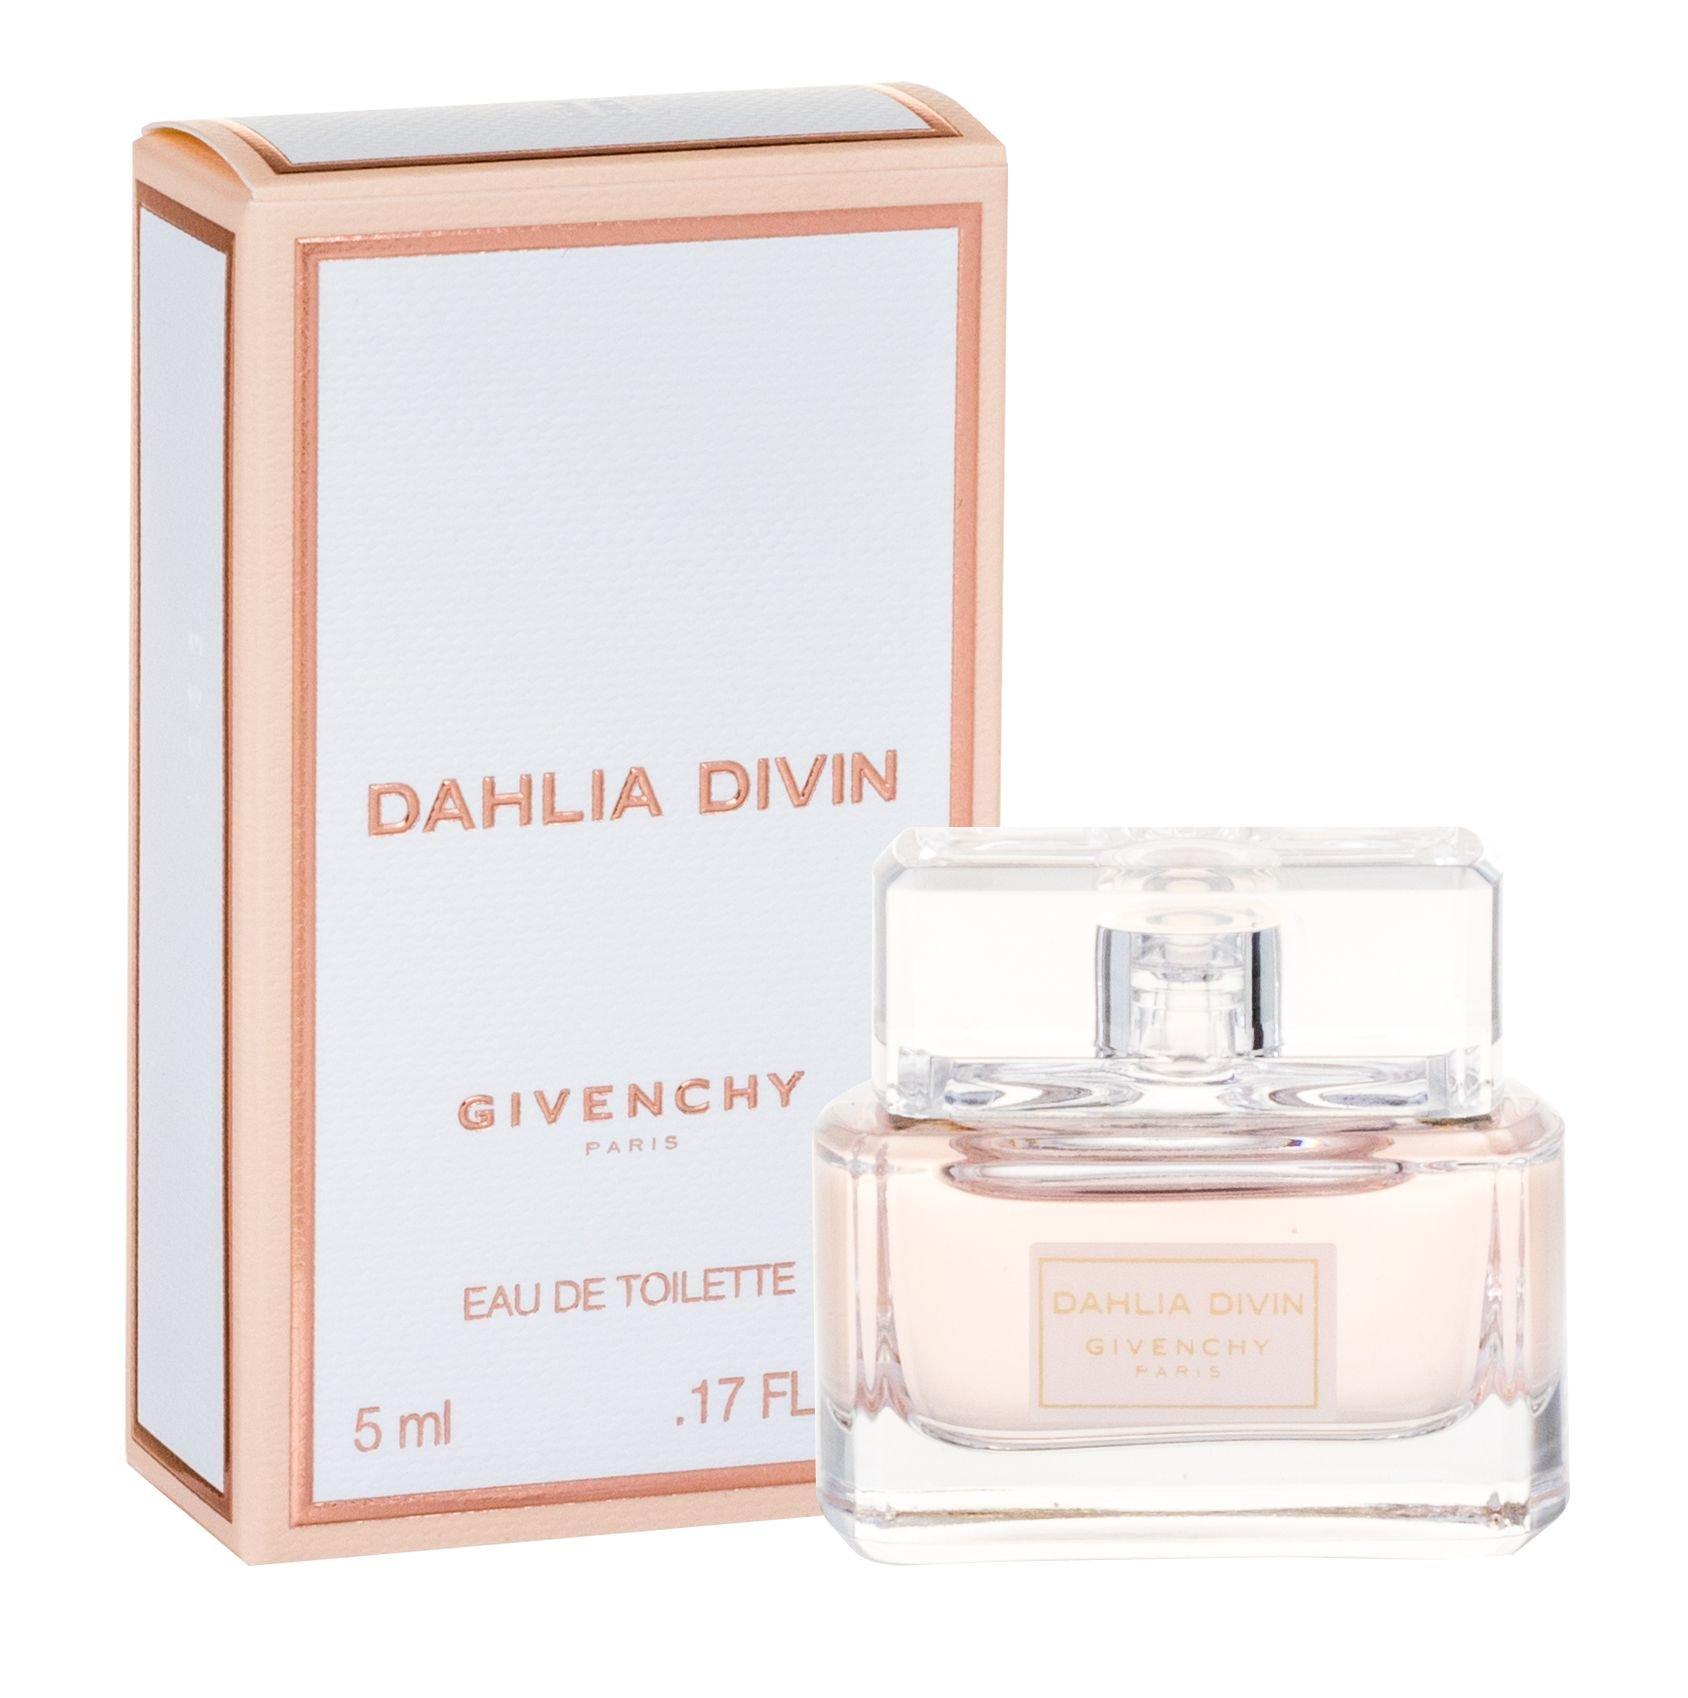 Givenchy Dahlia Divin EDT 5ml